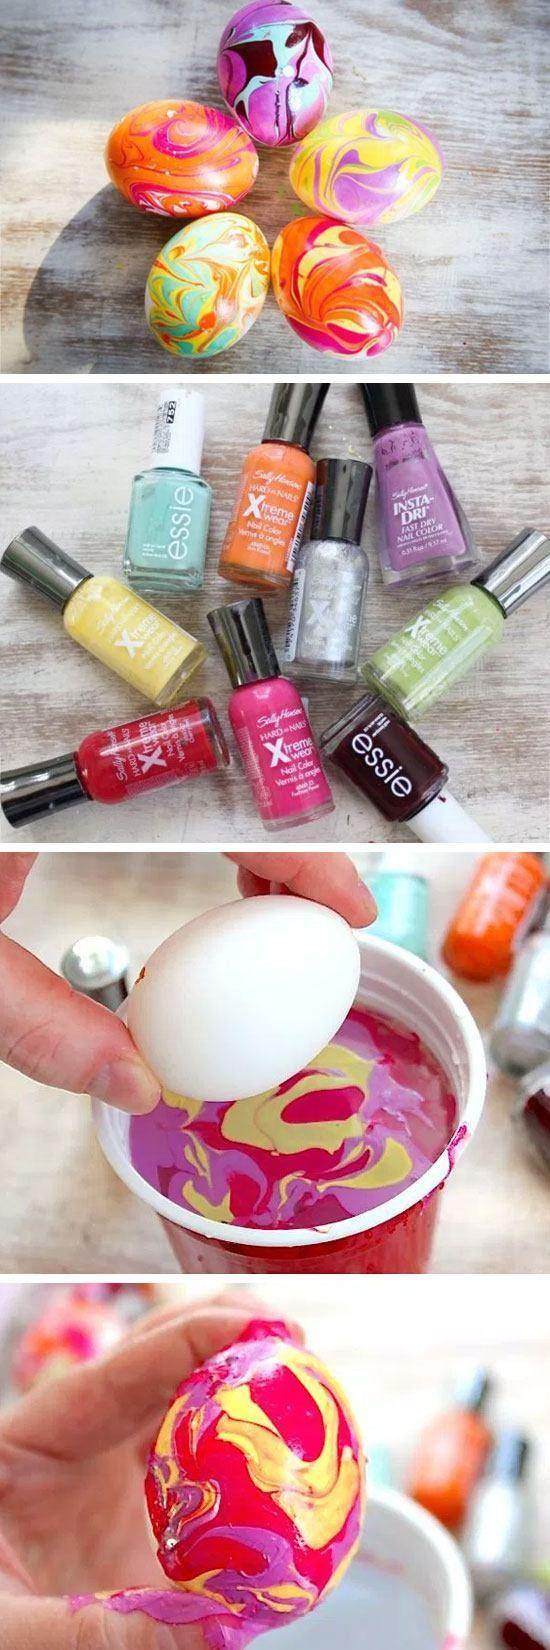 DIY Nail Polish Marbled Eggs | DIY Easter Egg Decorating Ideas for Kids